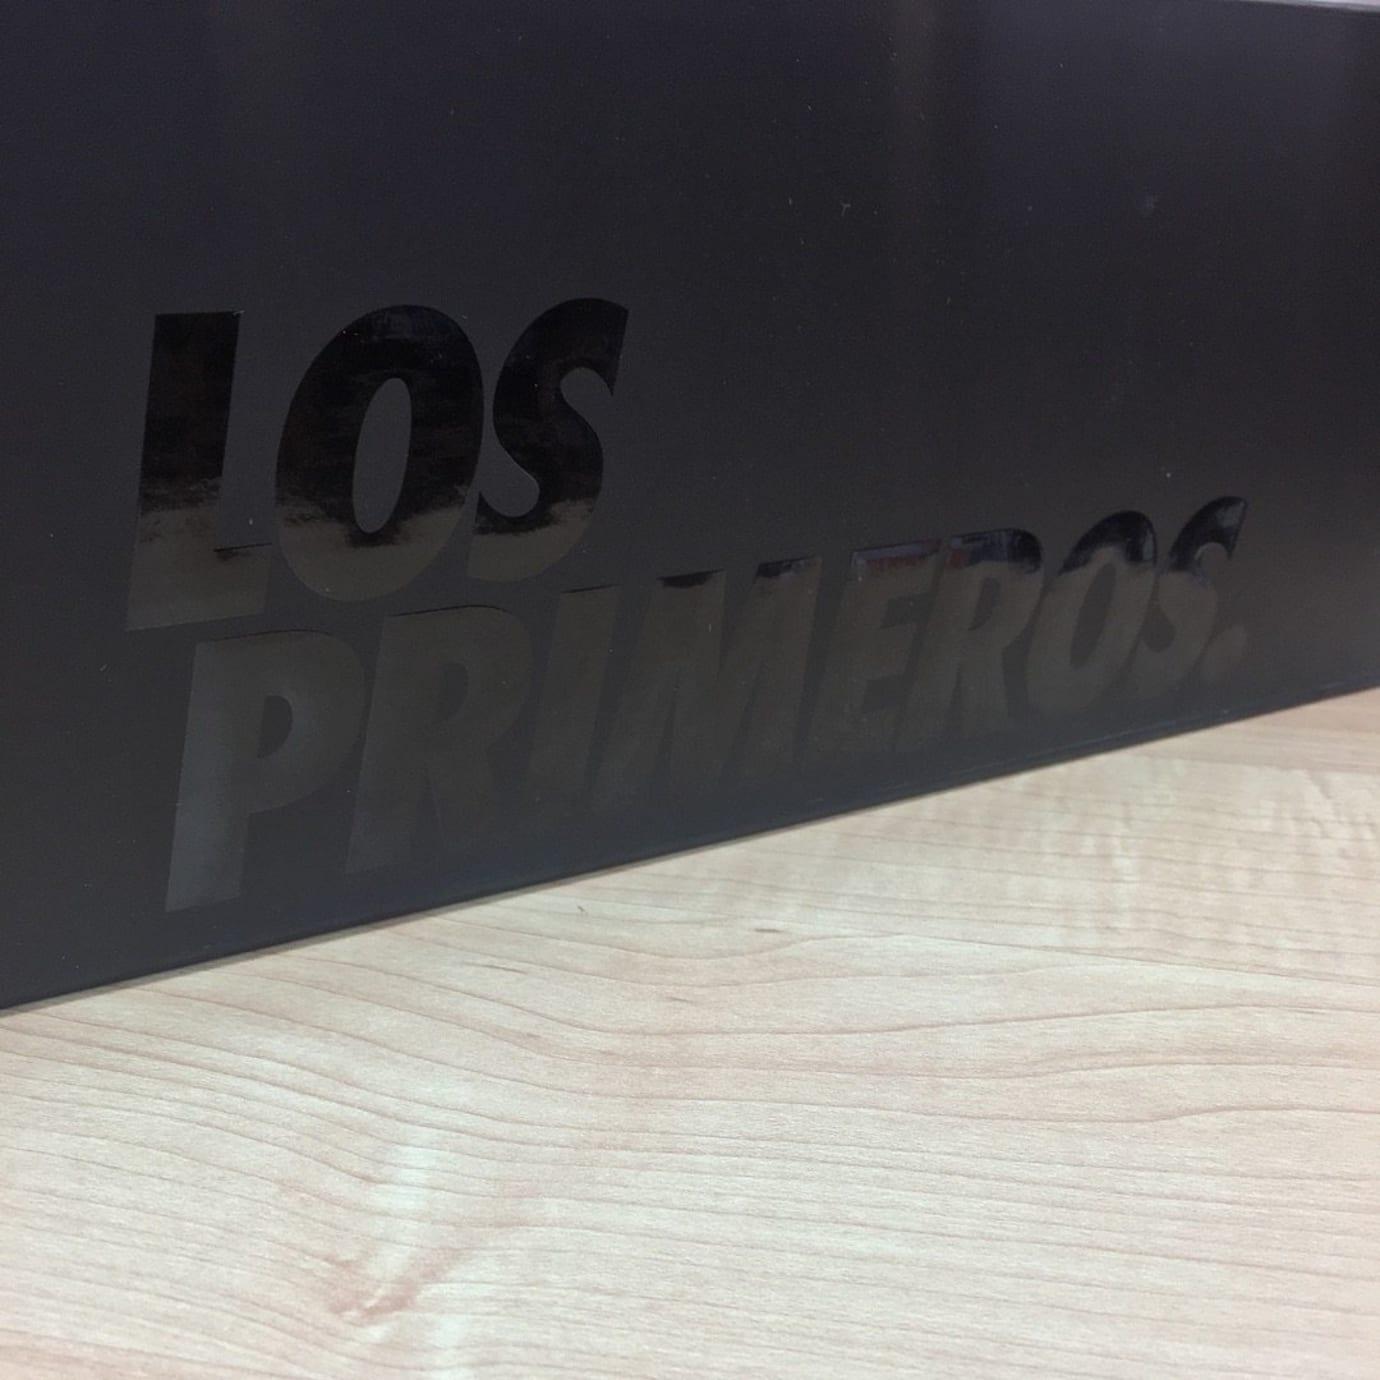 Nike Air Max 1 Los Primeros Hispanic Heritage Month Release Date (2)